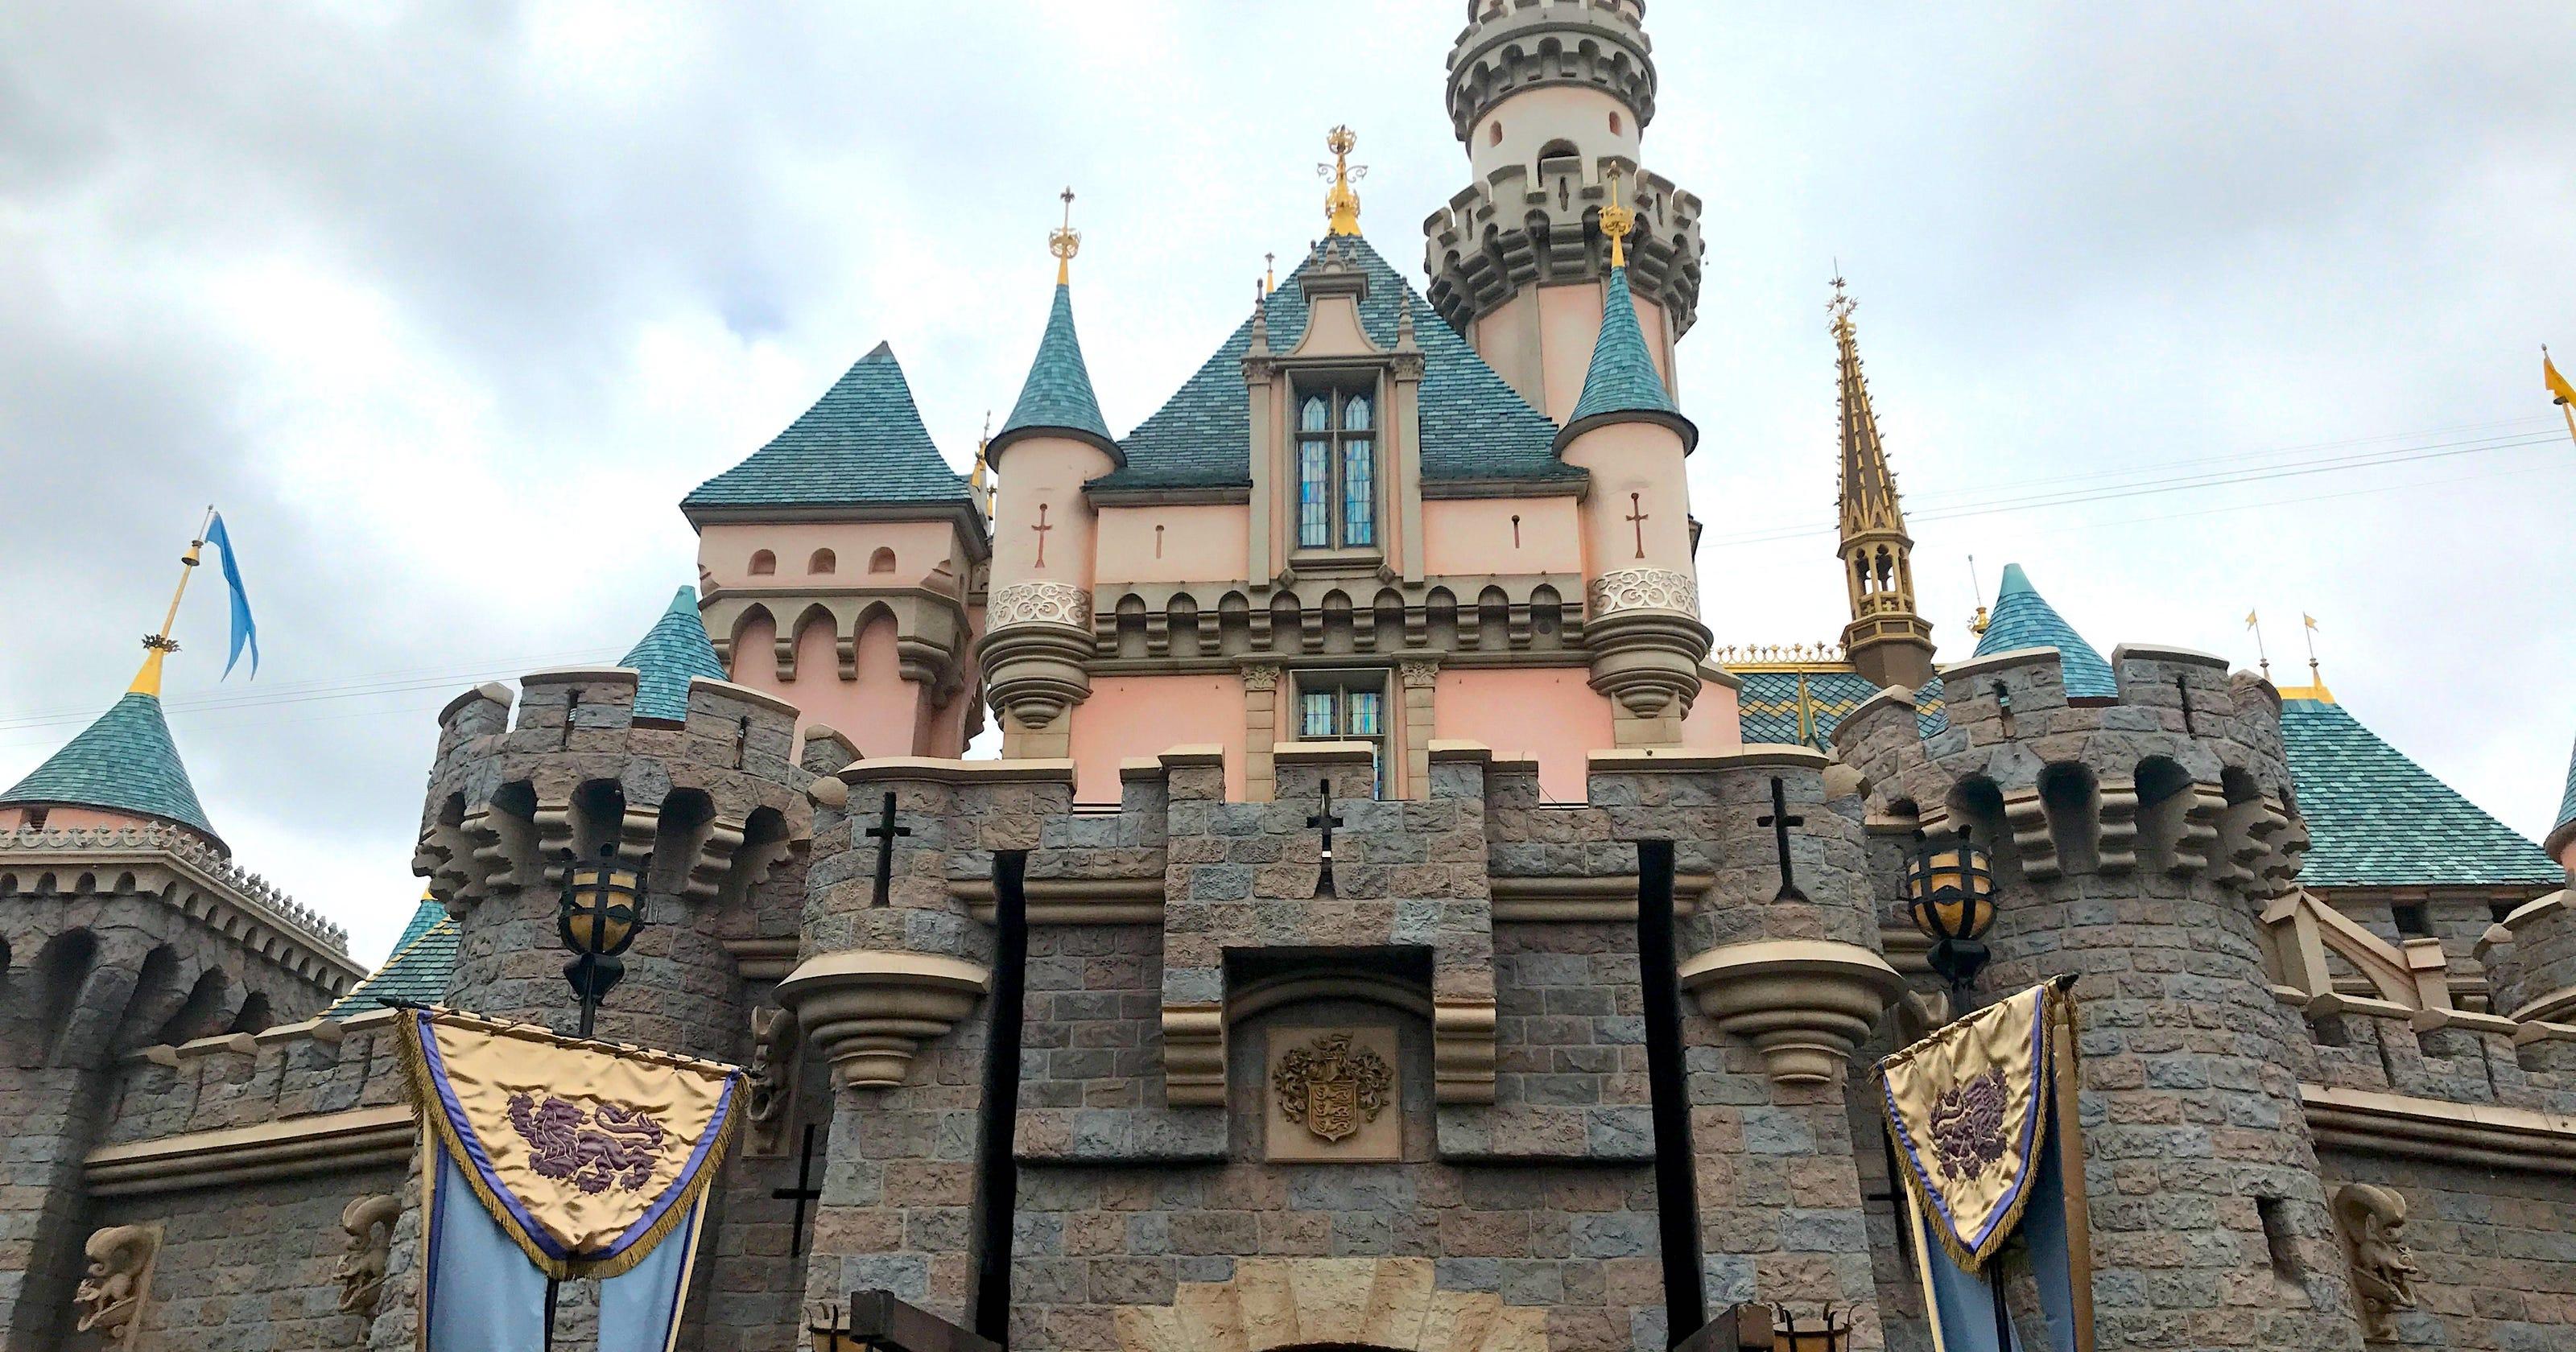 Southern California earthquake: Disneyland rides were delayed